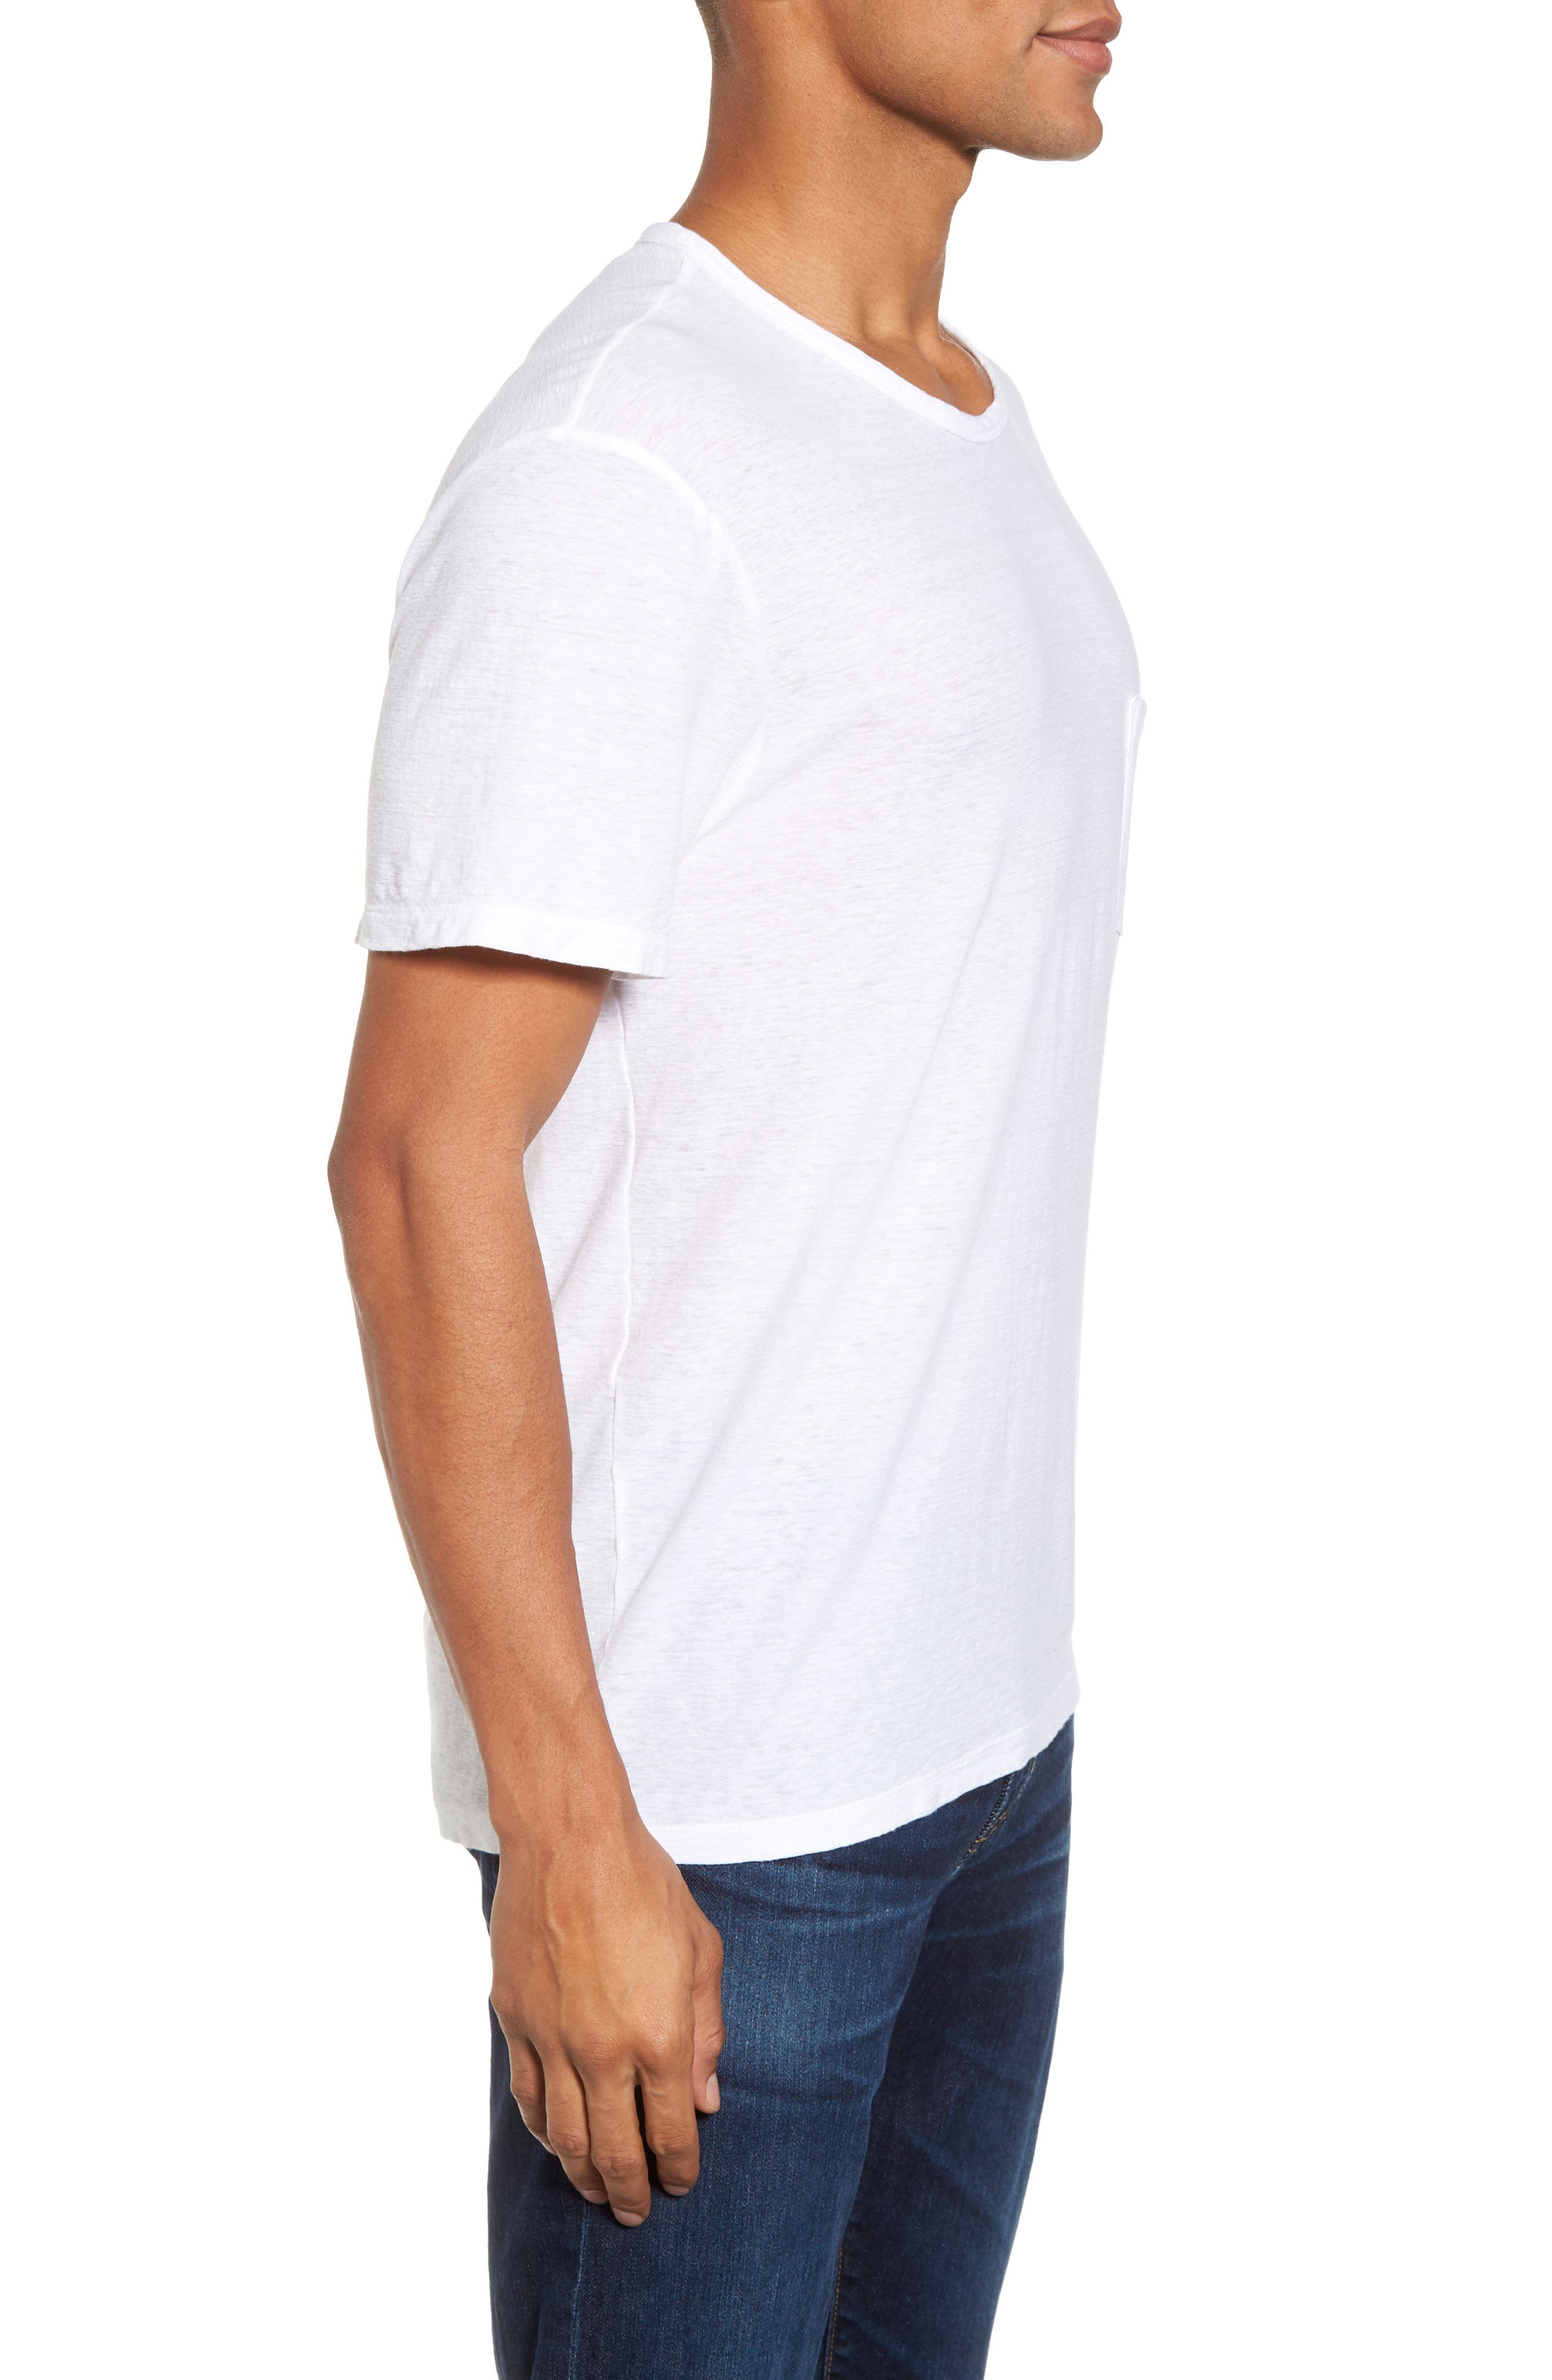 Alternate Image 3  - James Perse Cotton & Linen Pocket T-Shirt